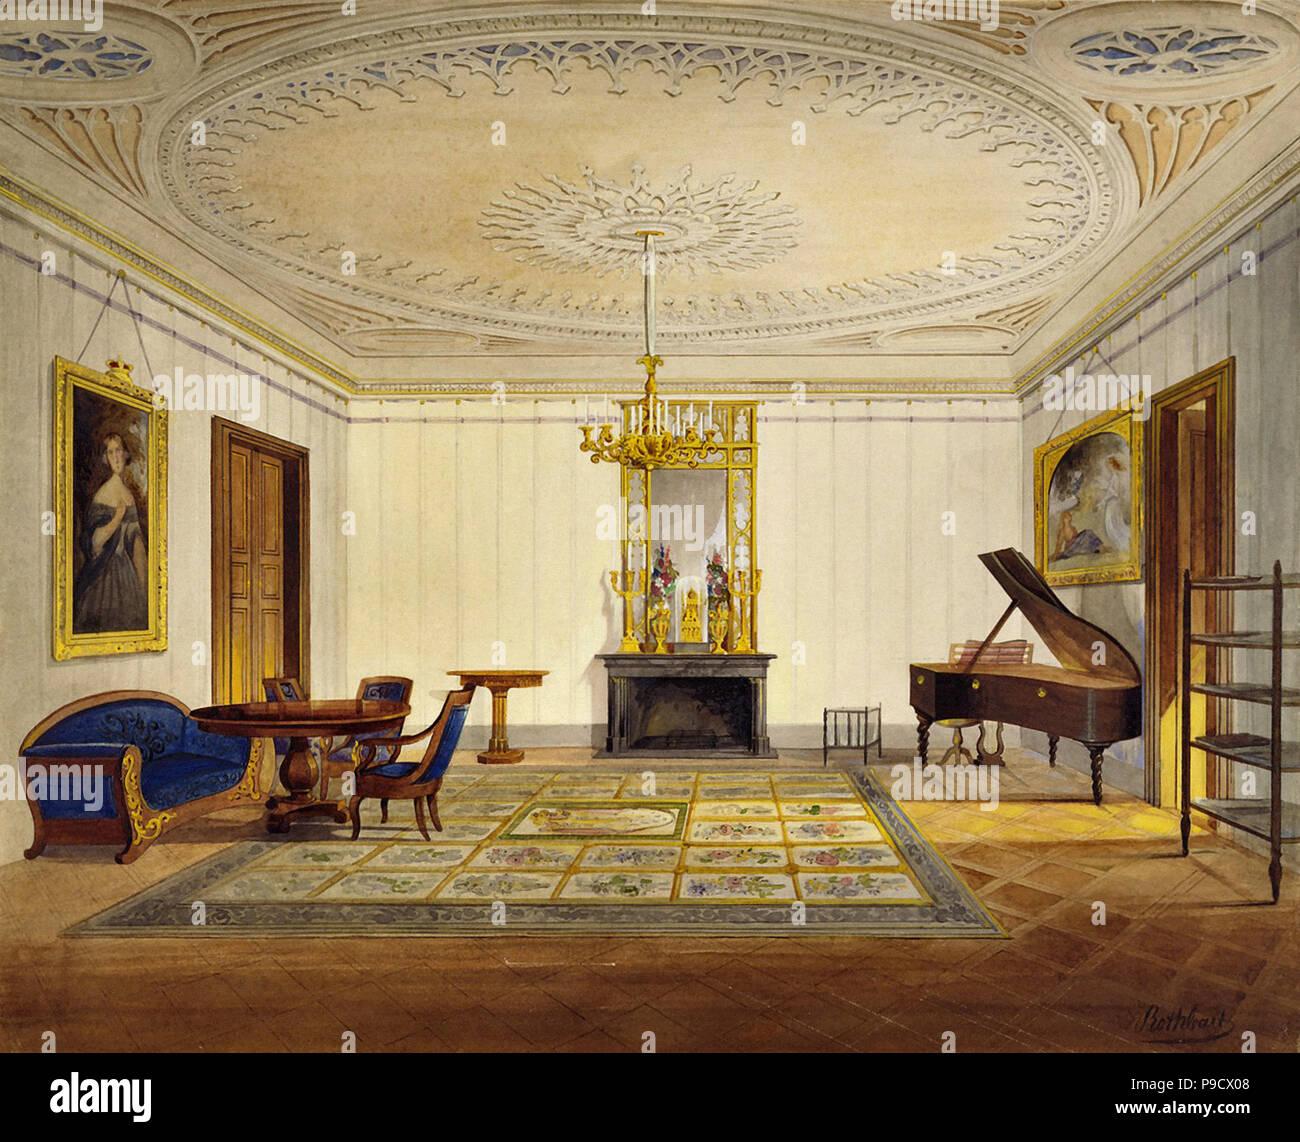 Rothbart  Georg Konrad - Schloss Callenberg - the Duchess's Sitting Room - Stock Image